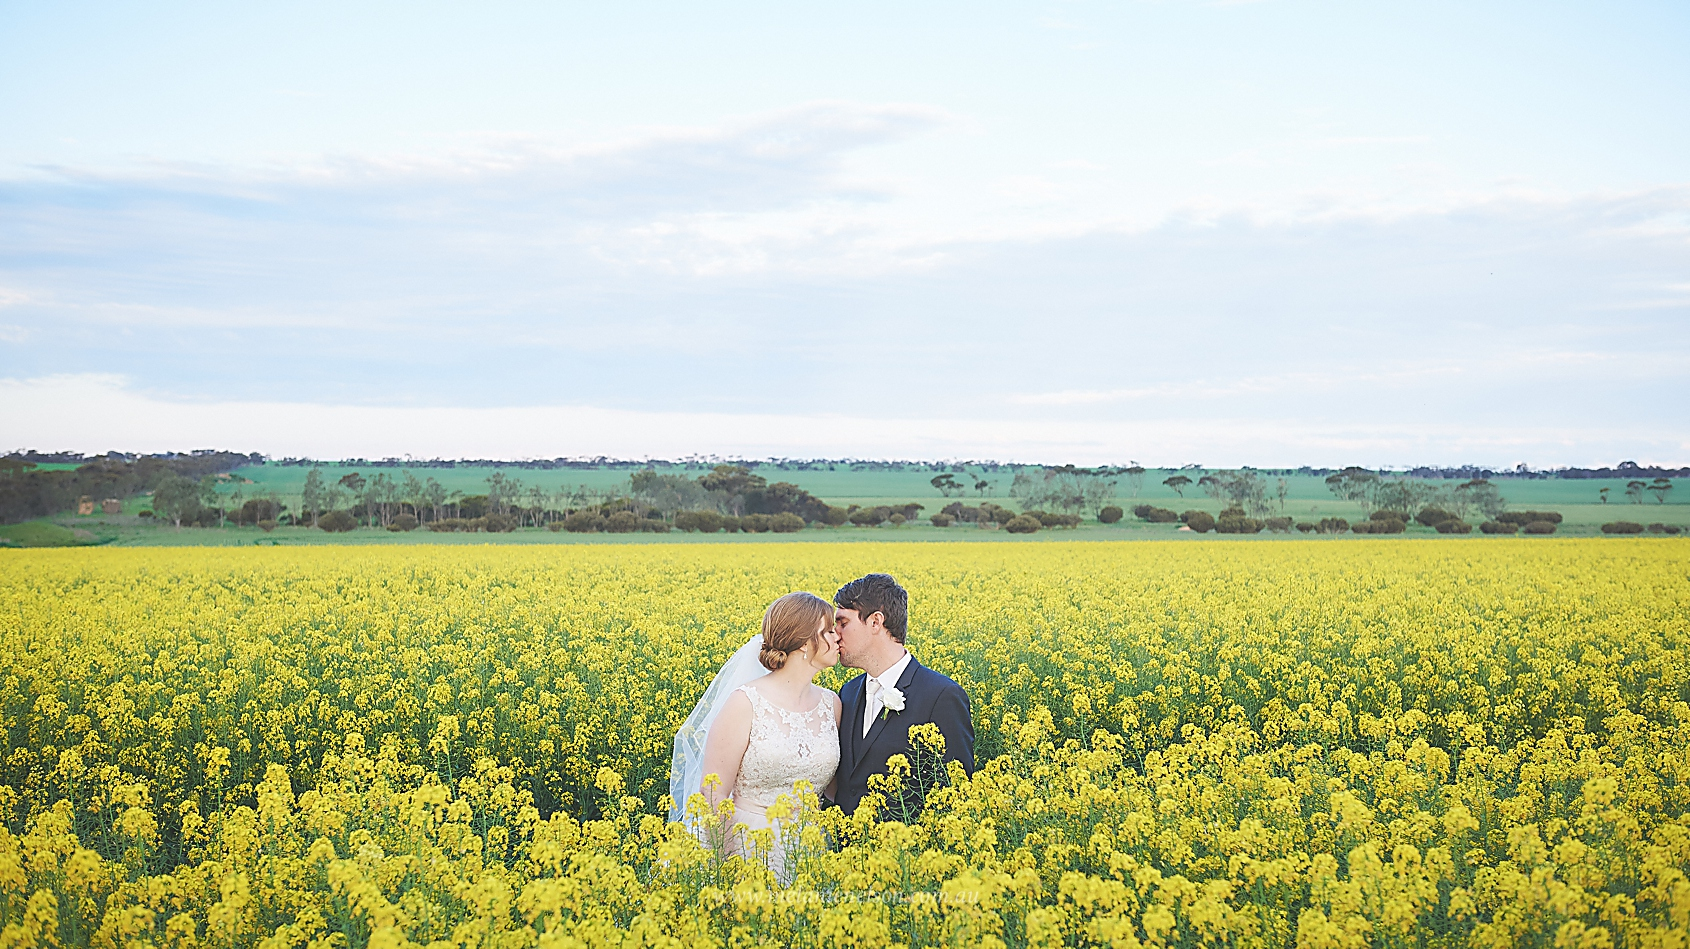 yorke_peninsula_wedding_photographer_0088.jpg